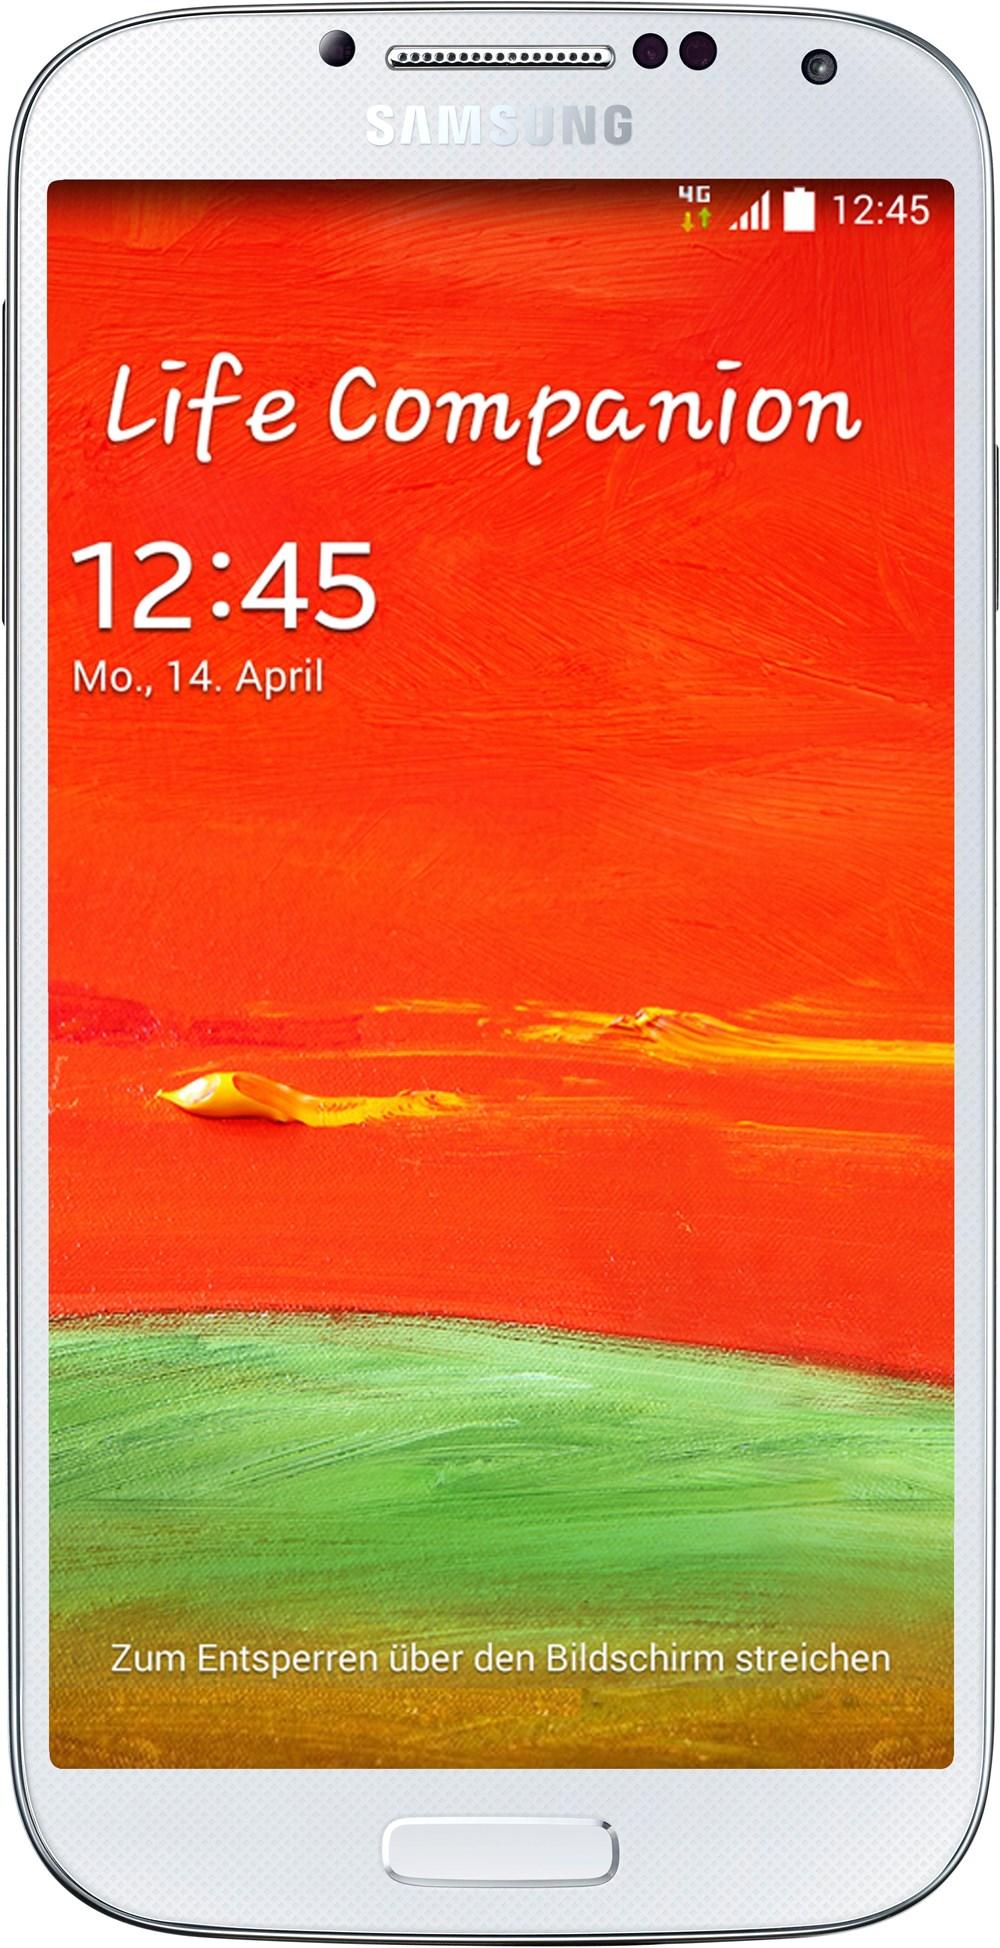 Samsung Galaxy S4 i9515, 16 GB, Smartphone ohne Vertrag/SIMlock, weiß (Handy) GT-I9515ZWADBT